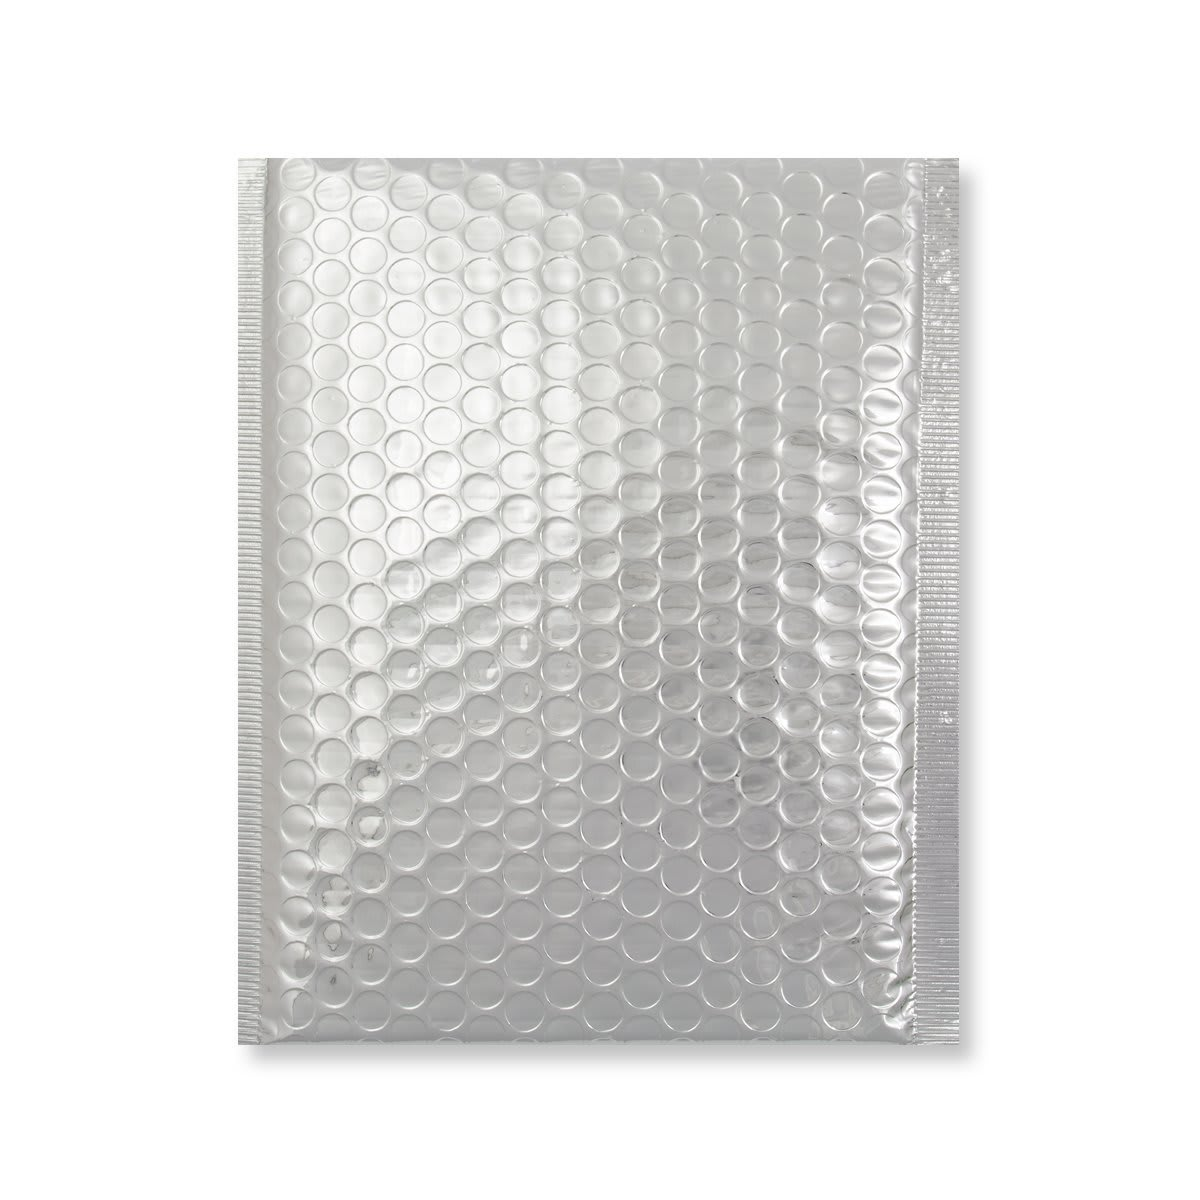 C5 + GLOSS METALLIC SILVER PADDED ENVELOPES (250 x 180MM)